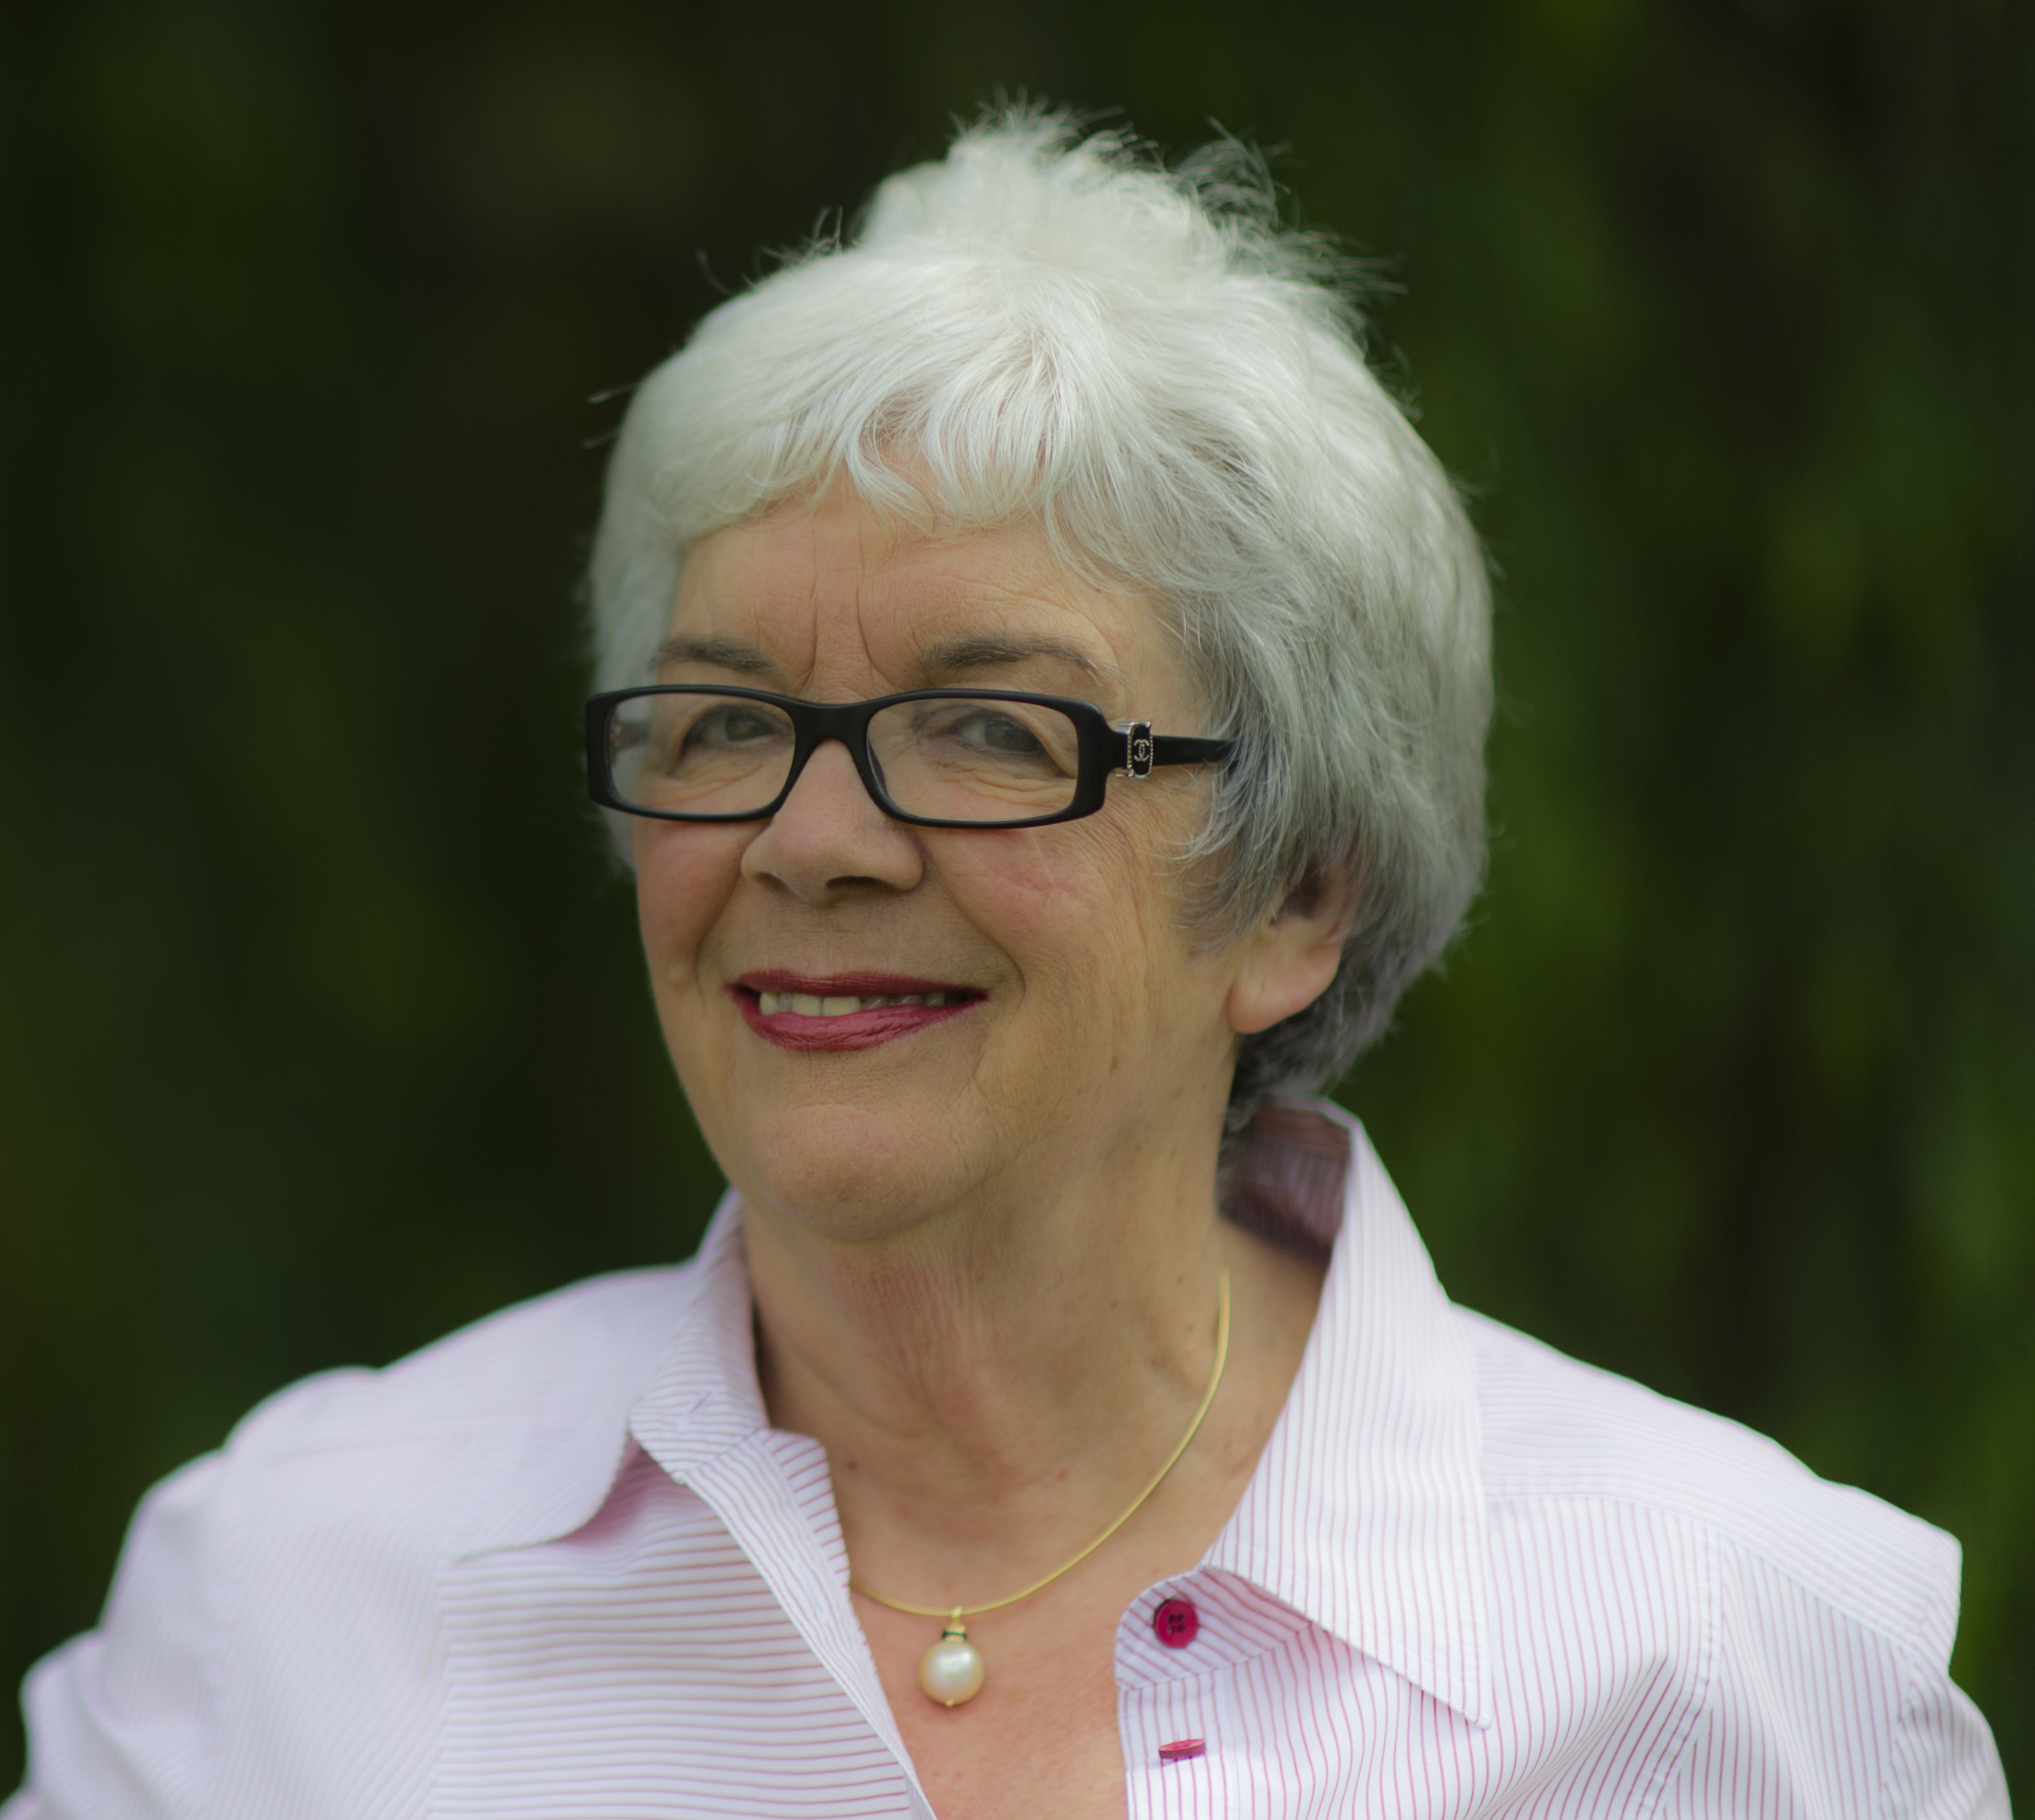 Q&A with Sheila O'Sullivan